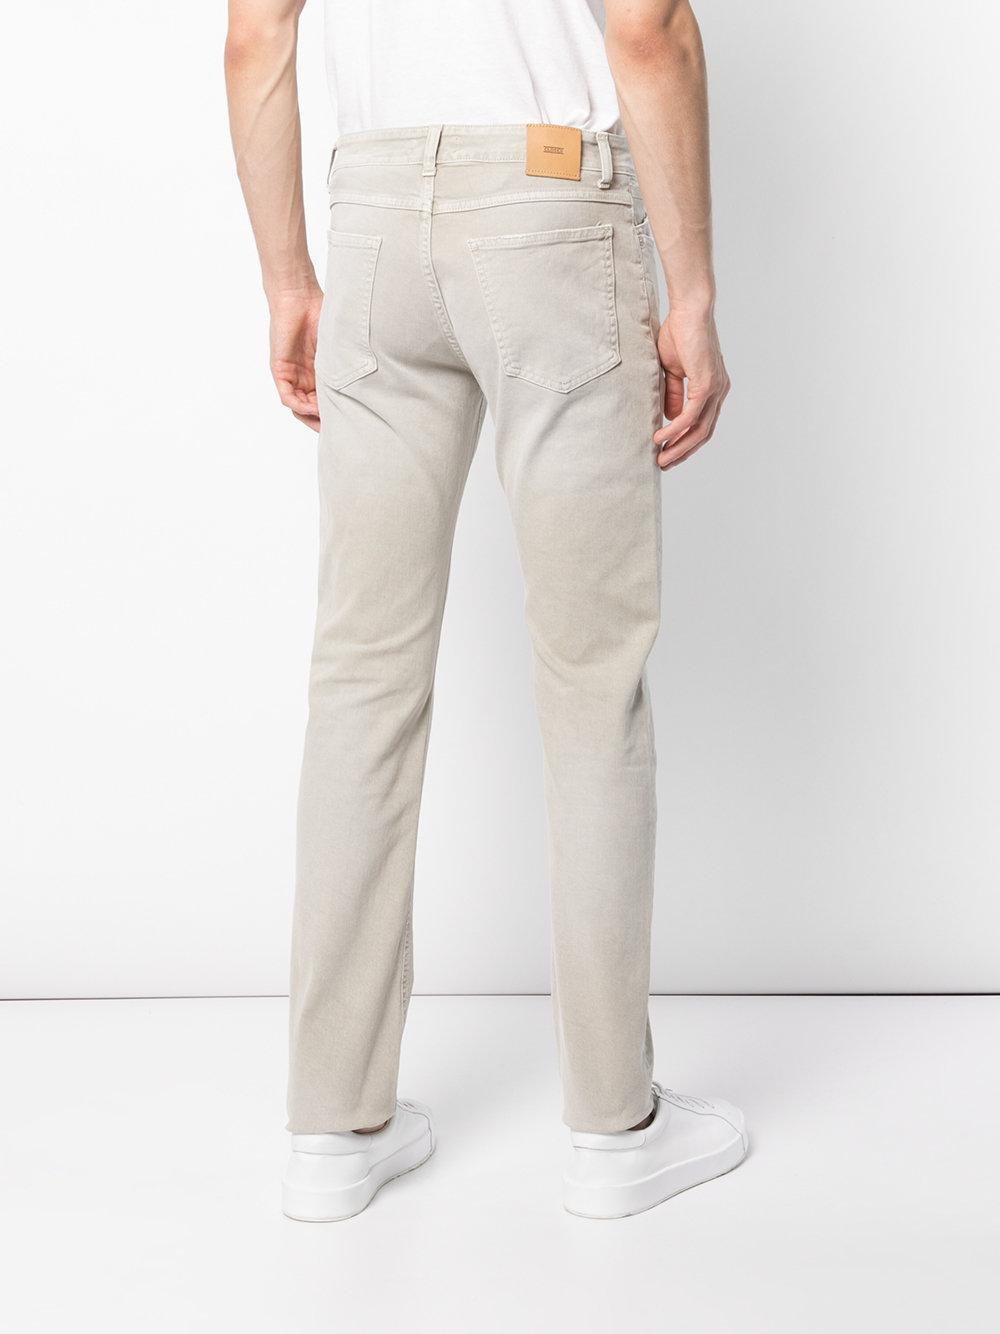 Closed Denim Slim-fit Jeans in Natural for Men